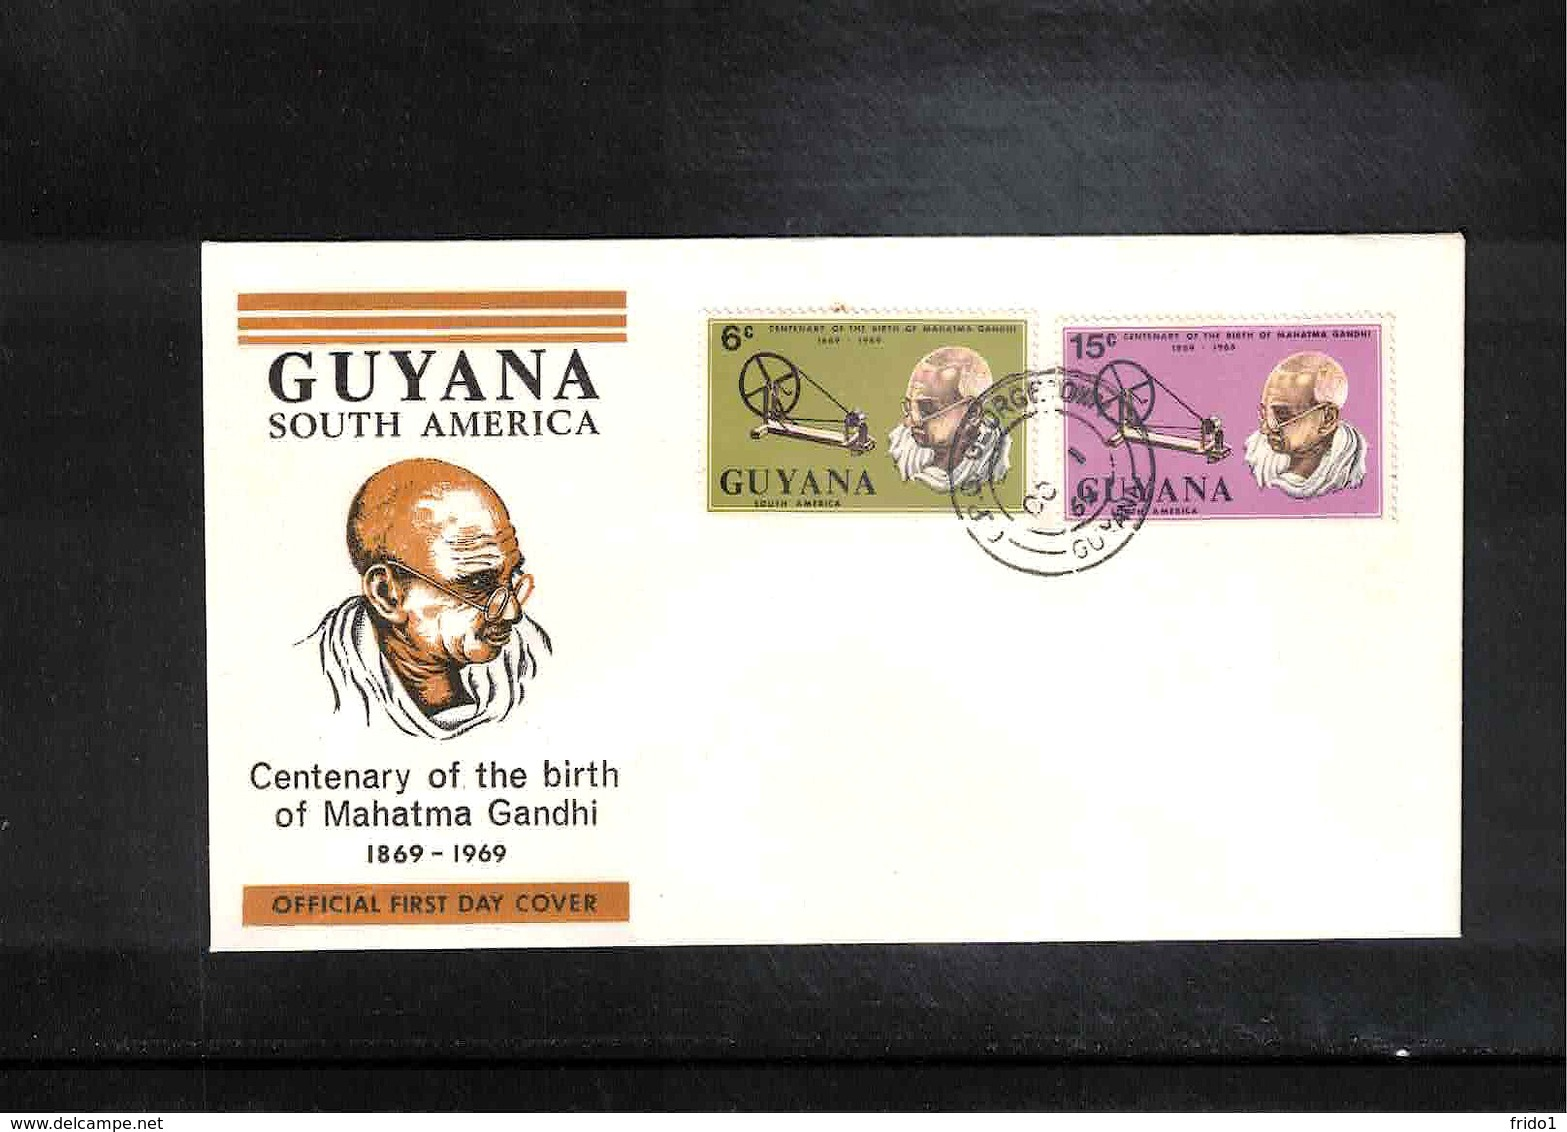 Guyana 1969 Mahatma Gandhi FDC - Mahatma Gandhi